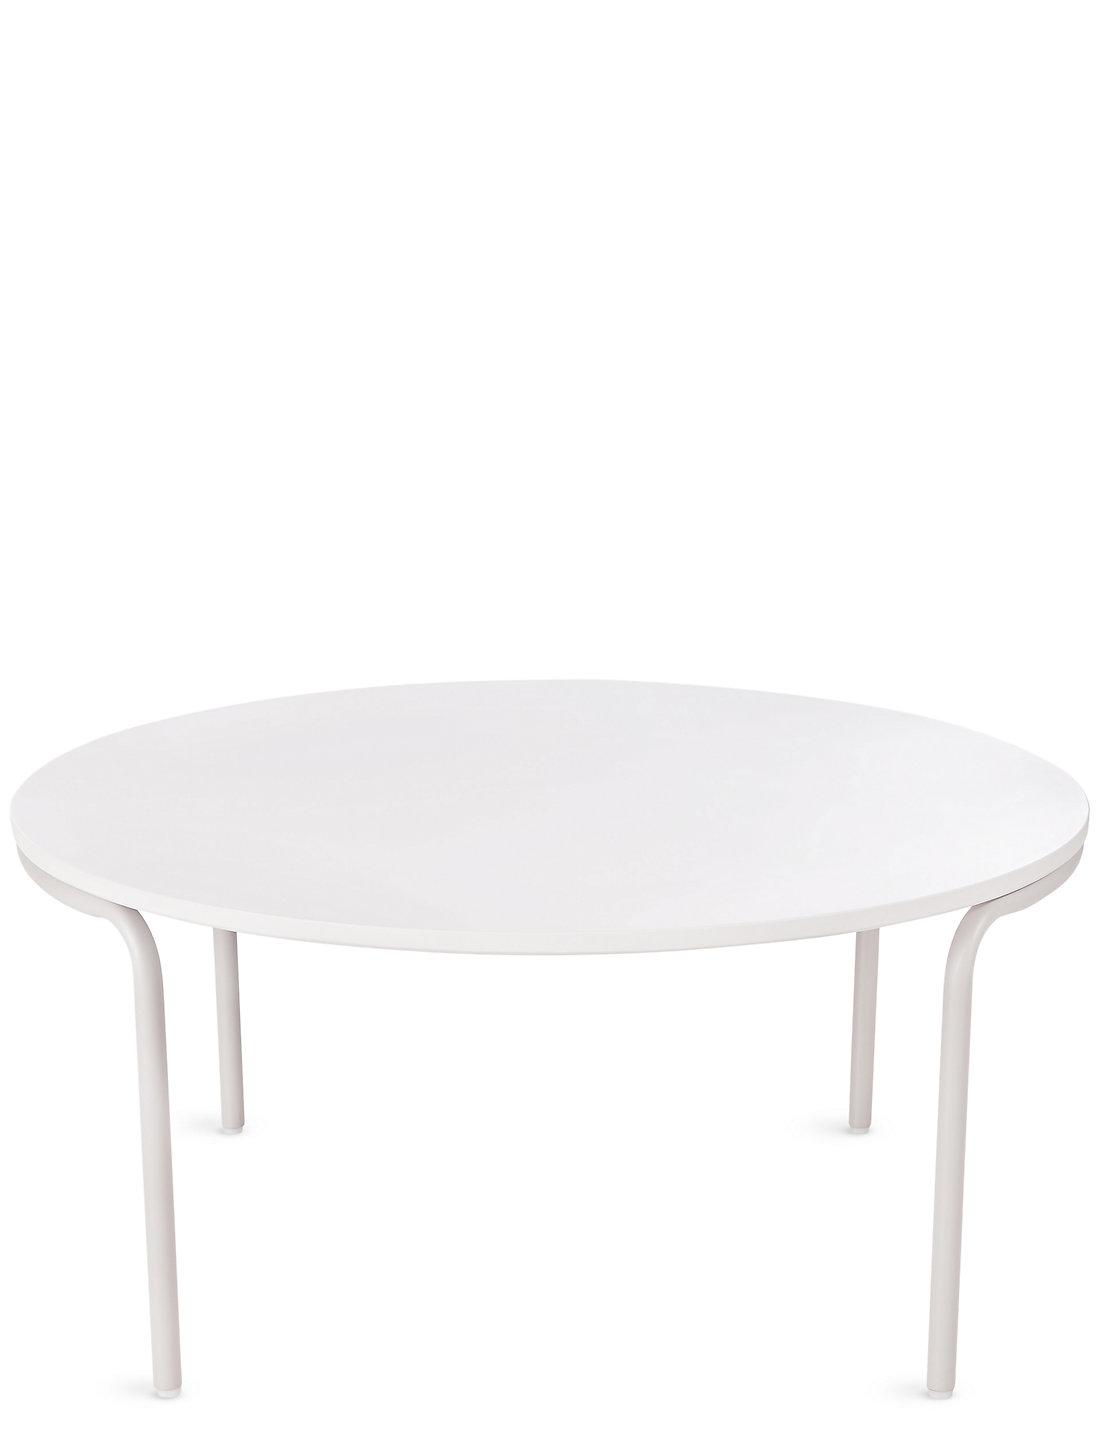 Theo coffee table ms theo coffee table geotapseo Choice Image